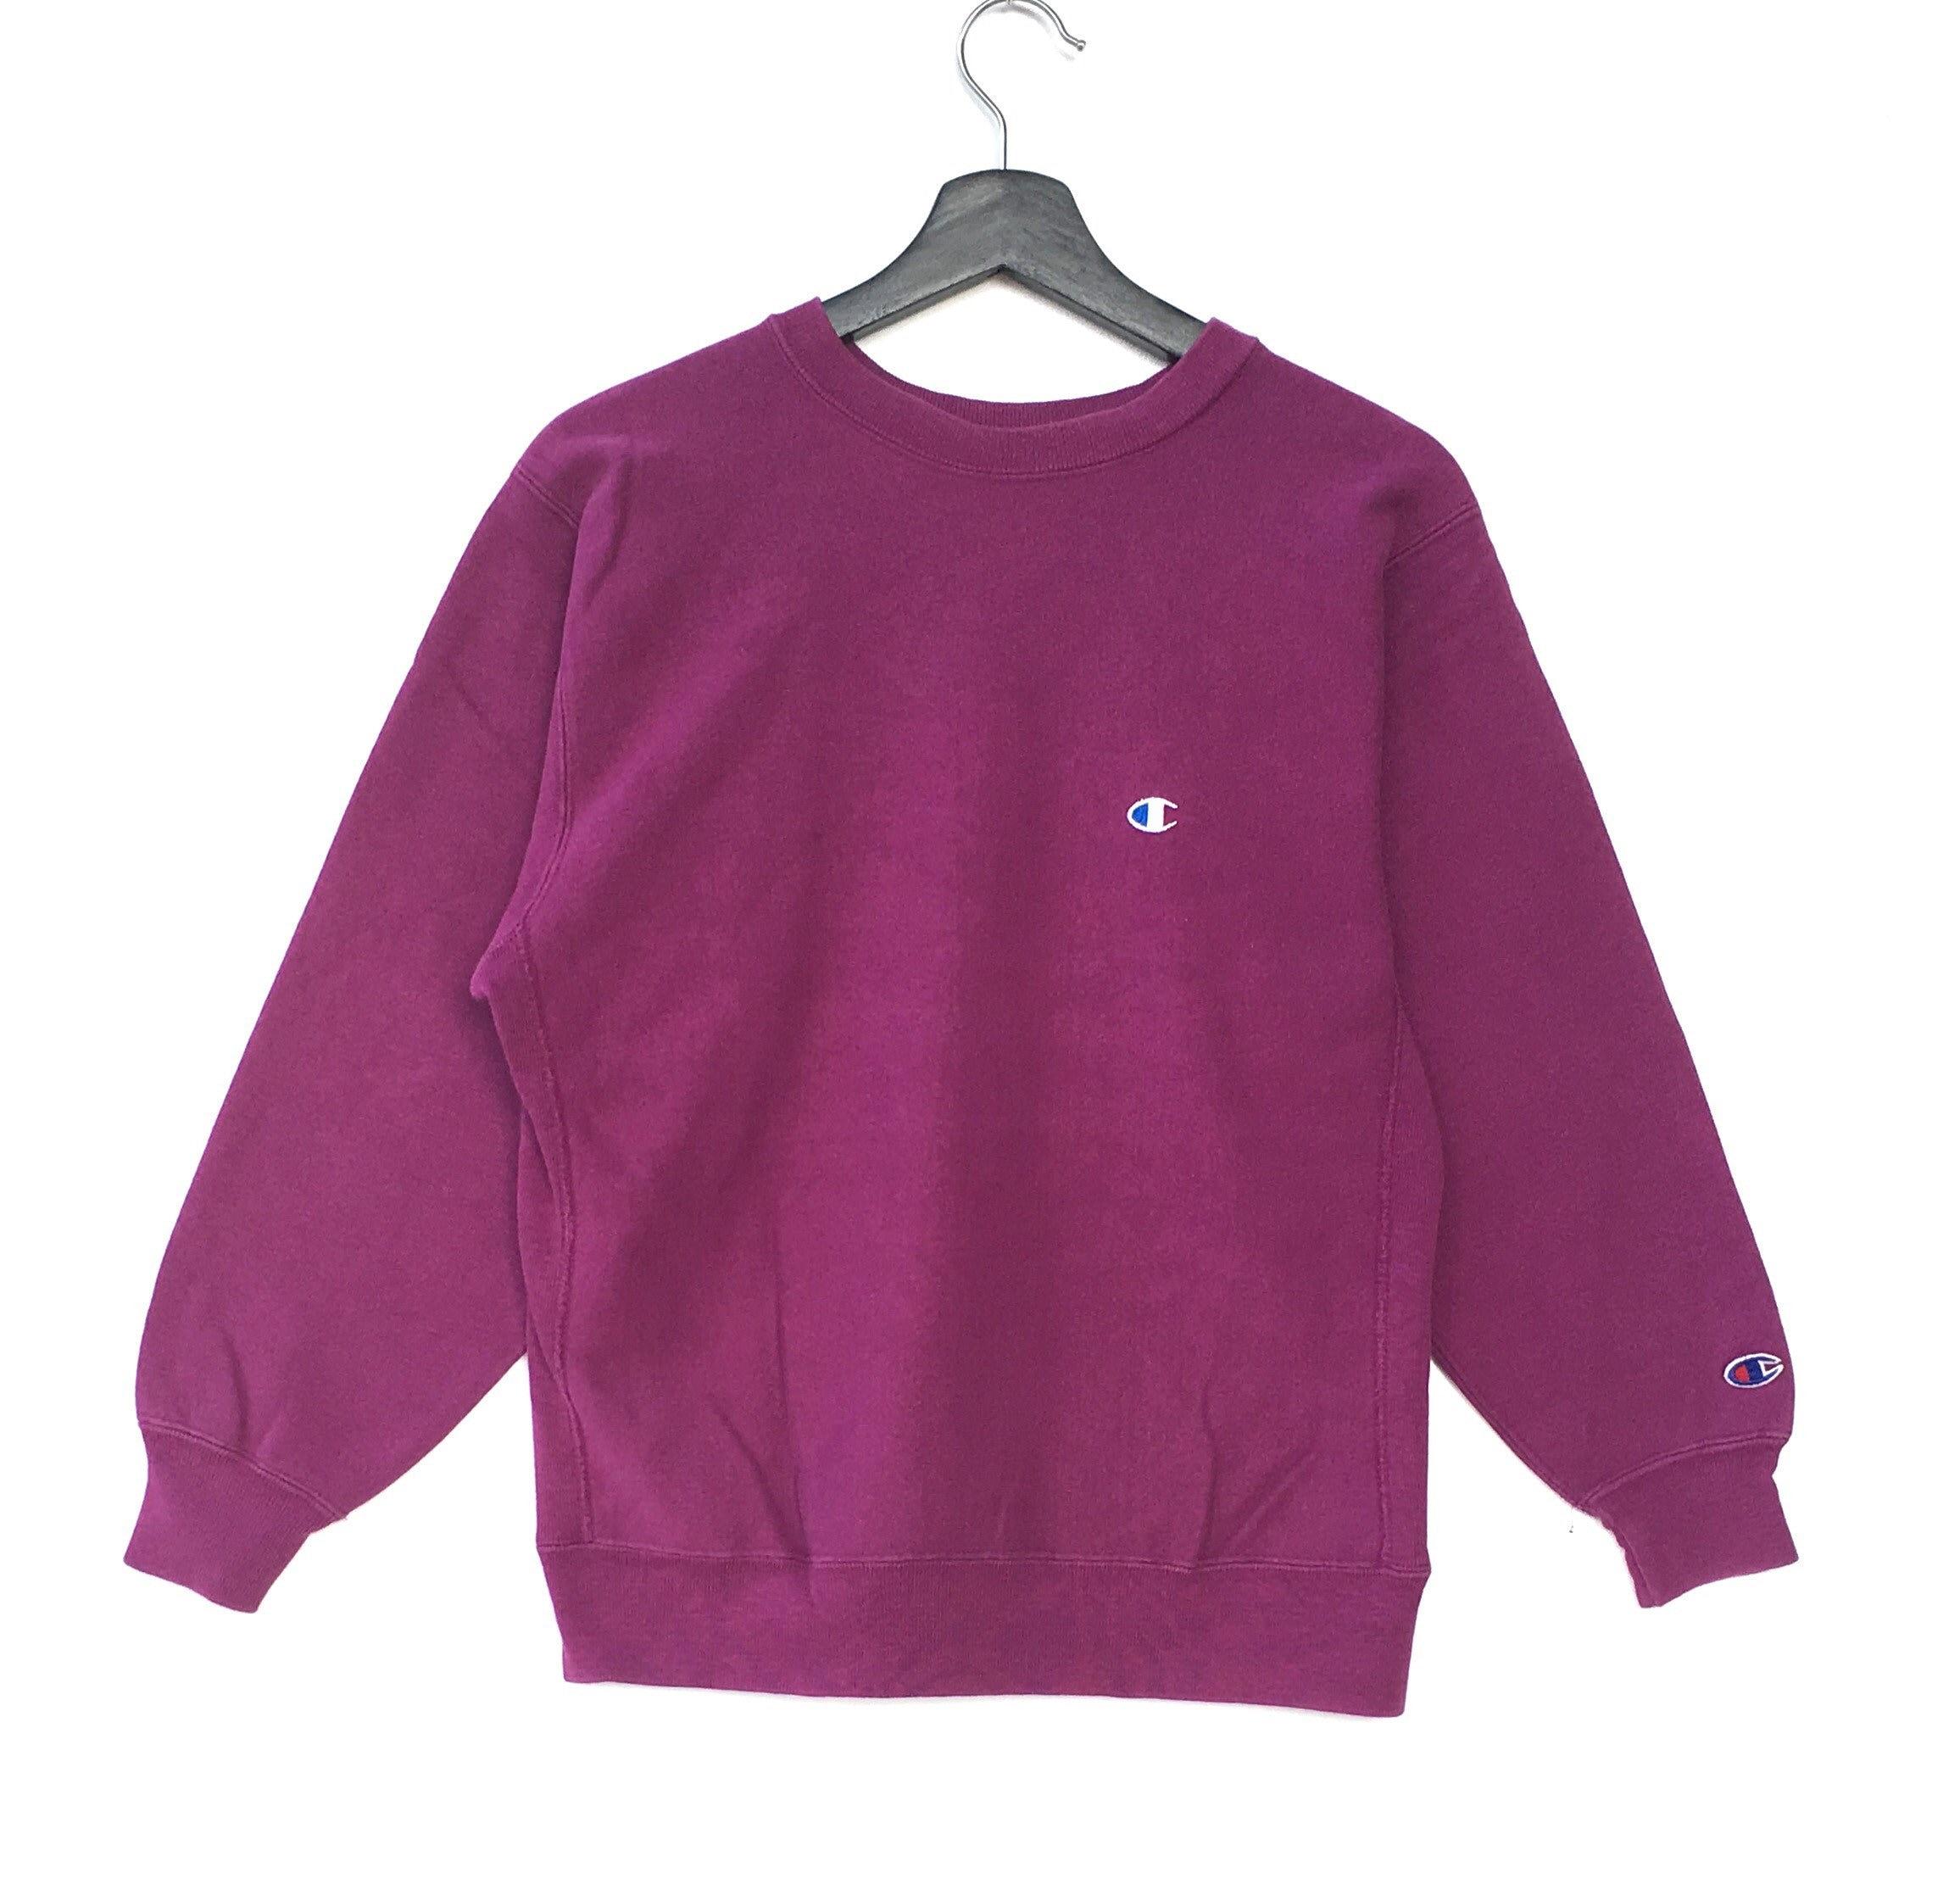 Rare!! Vintage PAPAS mademoiselle Non Non Sport Spellout Men Clothing Sweatshirt Pullover Jumper Light pink Colour Fits Medium Size WE7bVD